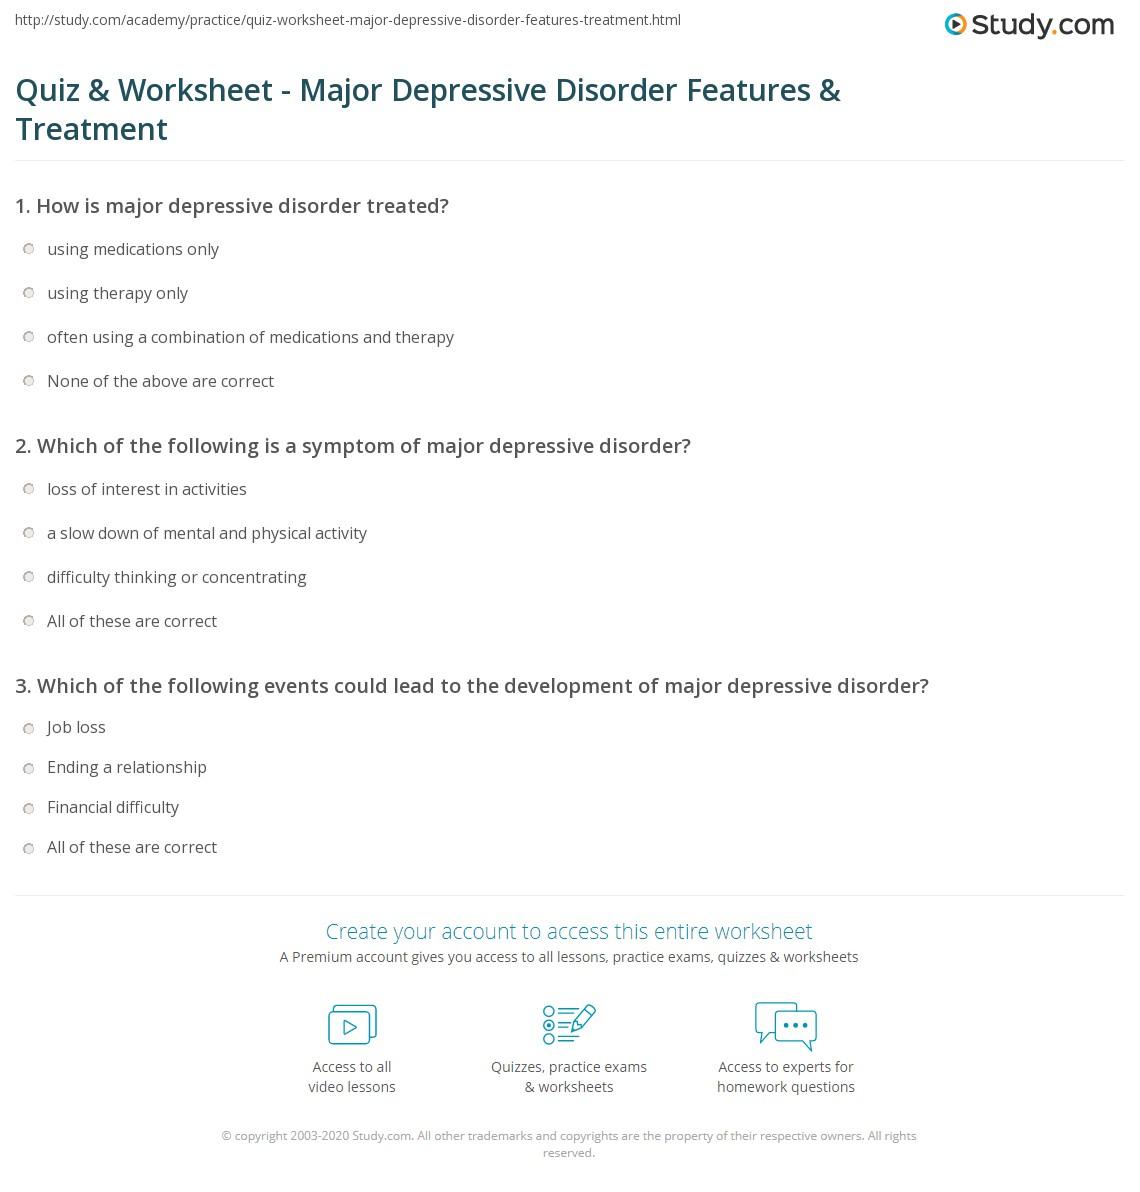 quiz & worksheet - major depressive disorder features & treatment